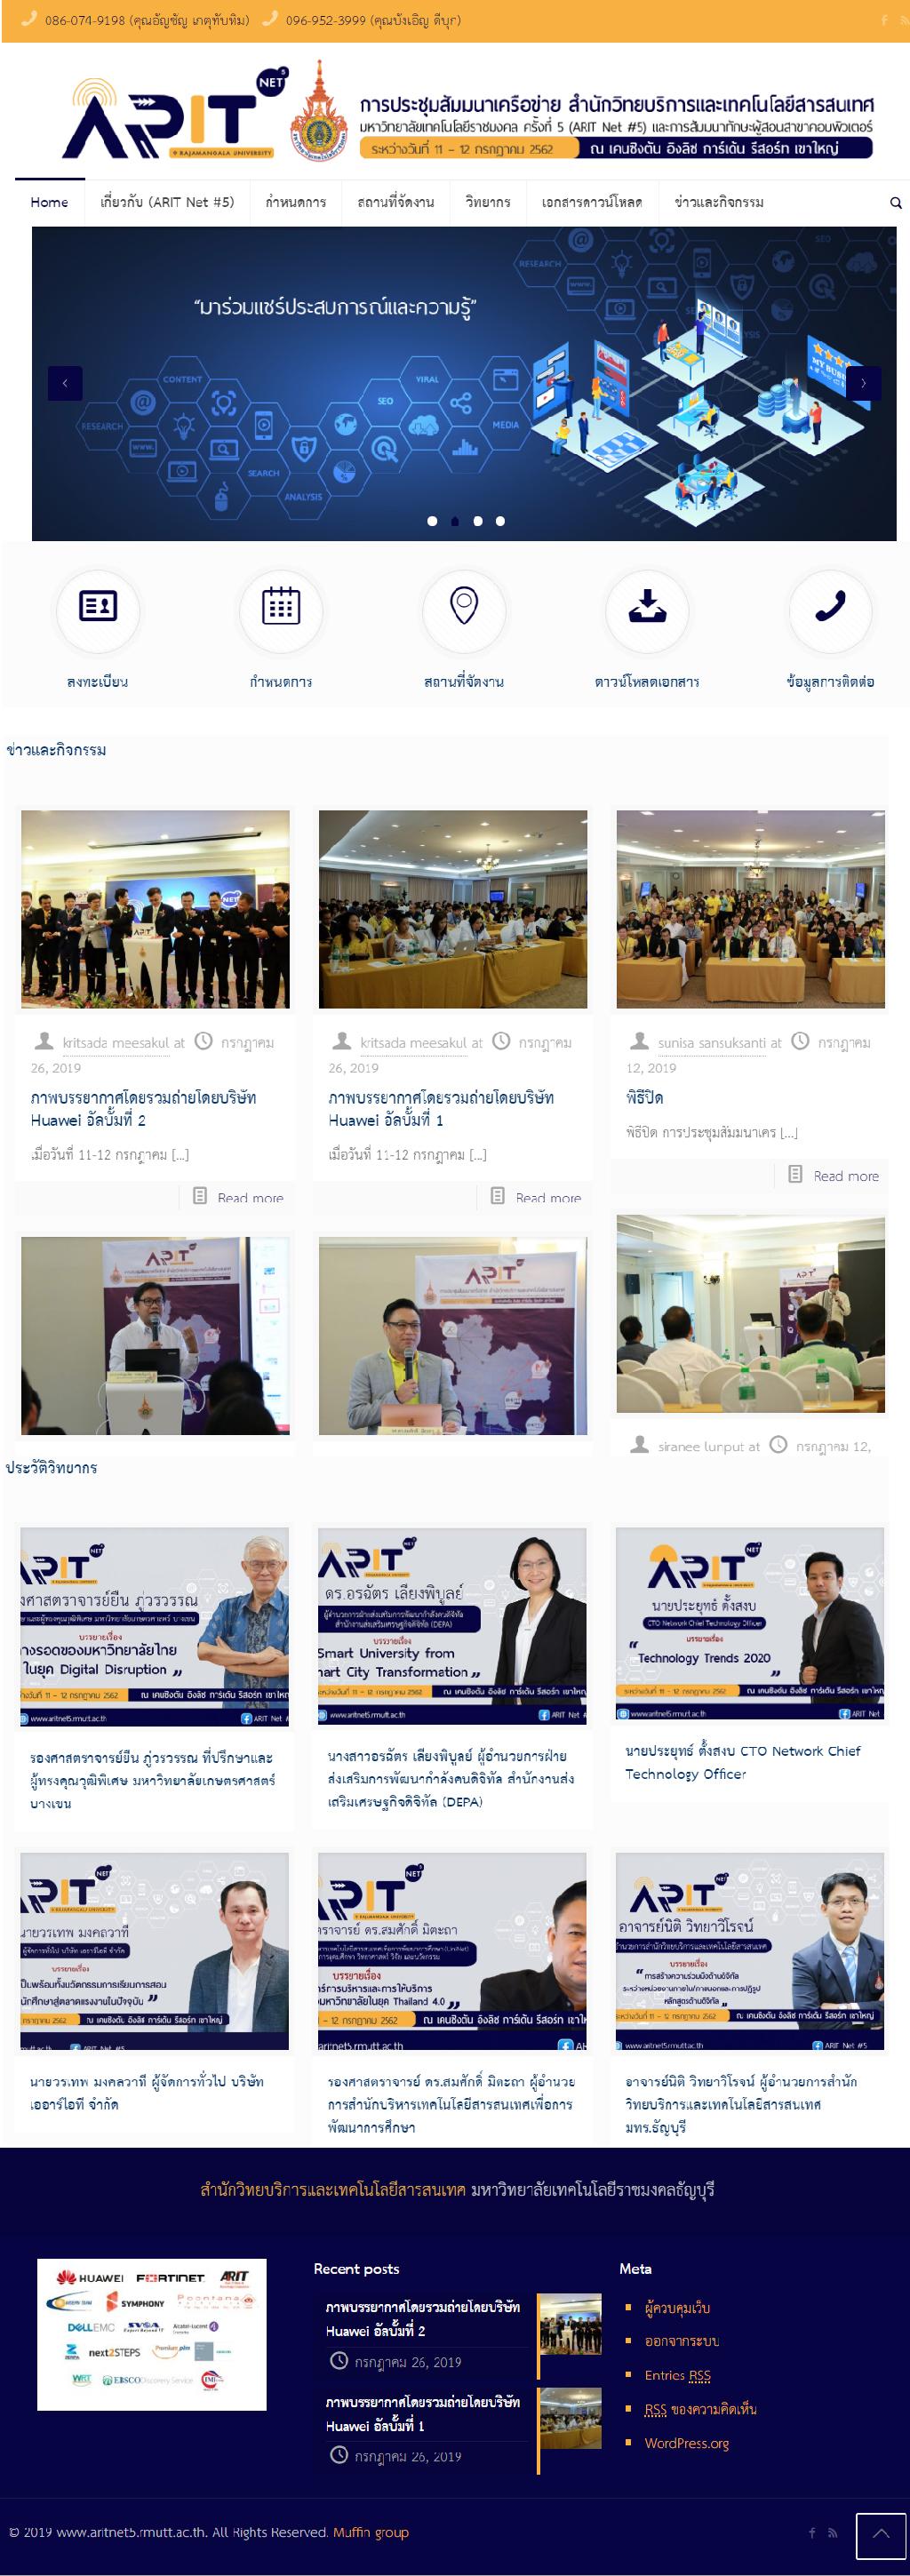 Website การประชุมสัมมนาเครือข่าย สำนักวิทยบริการและเทคโนโลยีสารสนเทศ มหาวิทยาลัยเทคโนโลยีราชมงคล ครั้งที่ 5 (ARIT Net #5) และการสัมมนาทักษะผู้สอนสาขาคอมพิวเตอร์